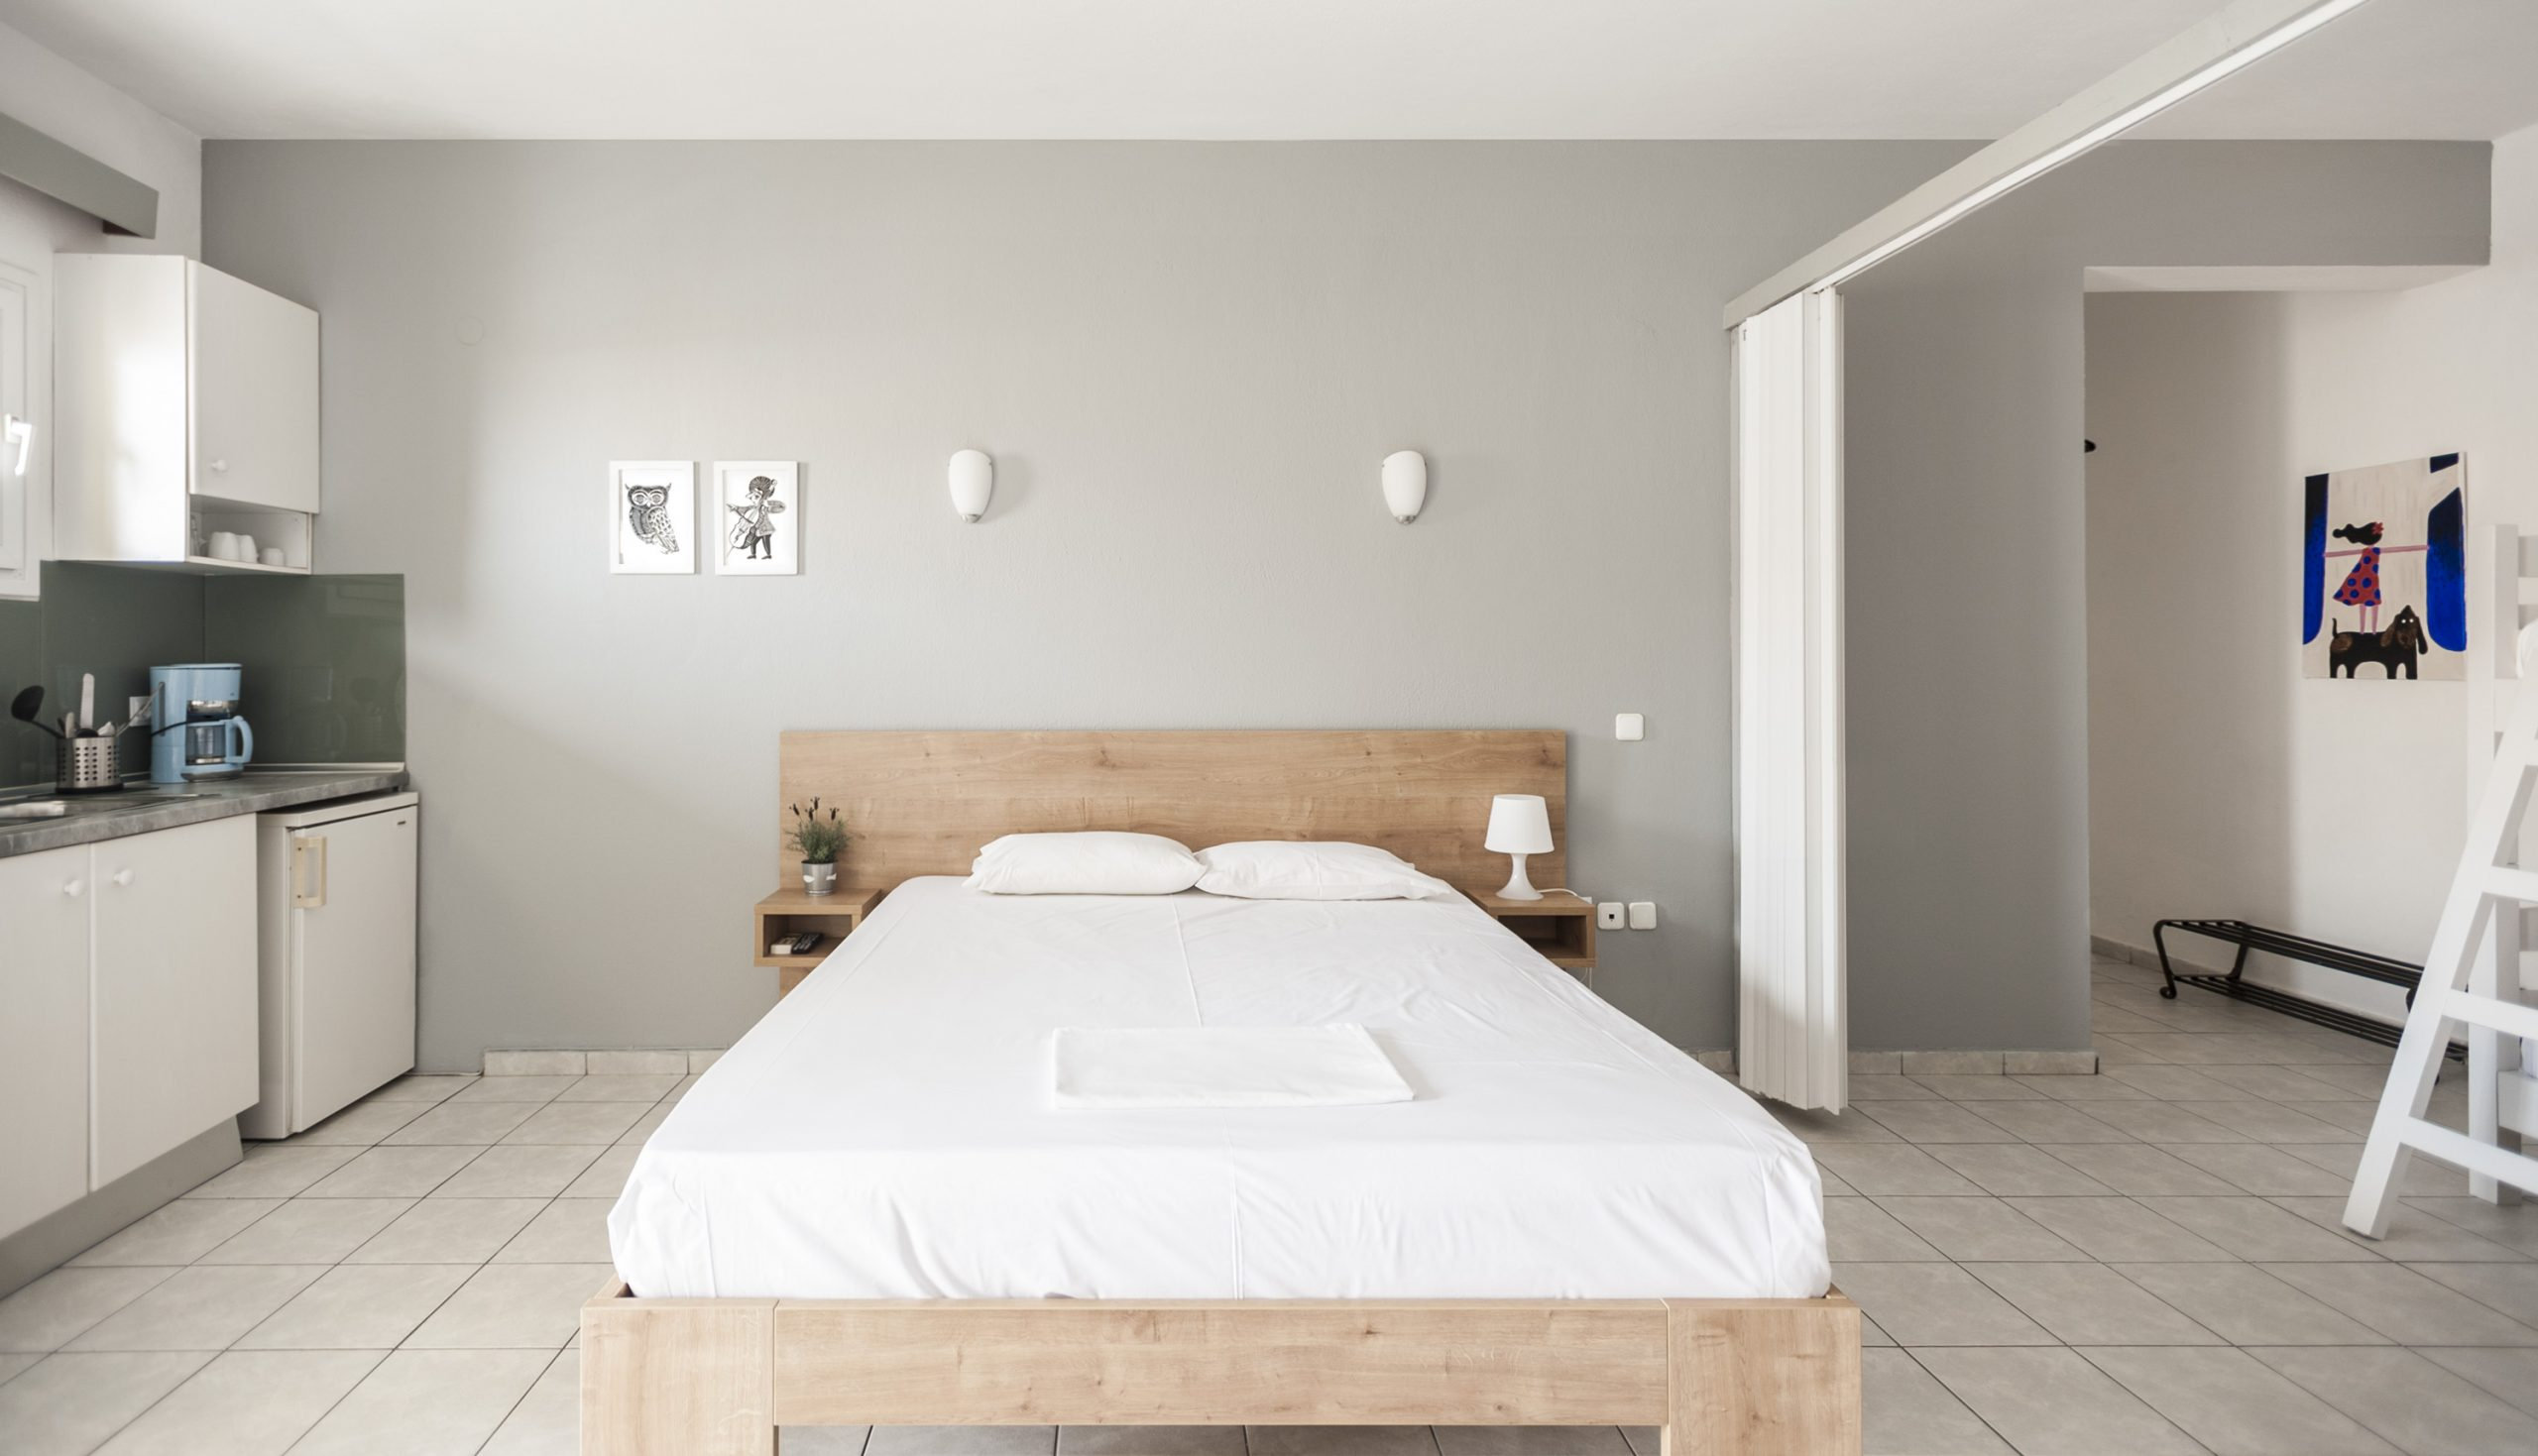 Afkos_rooms_006-1